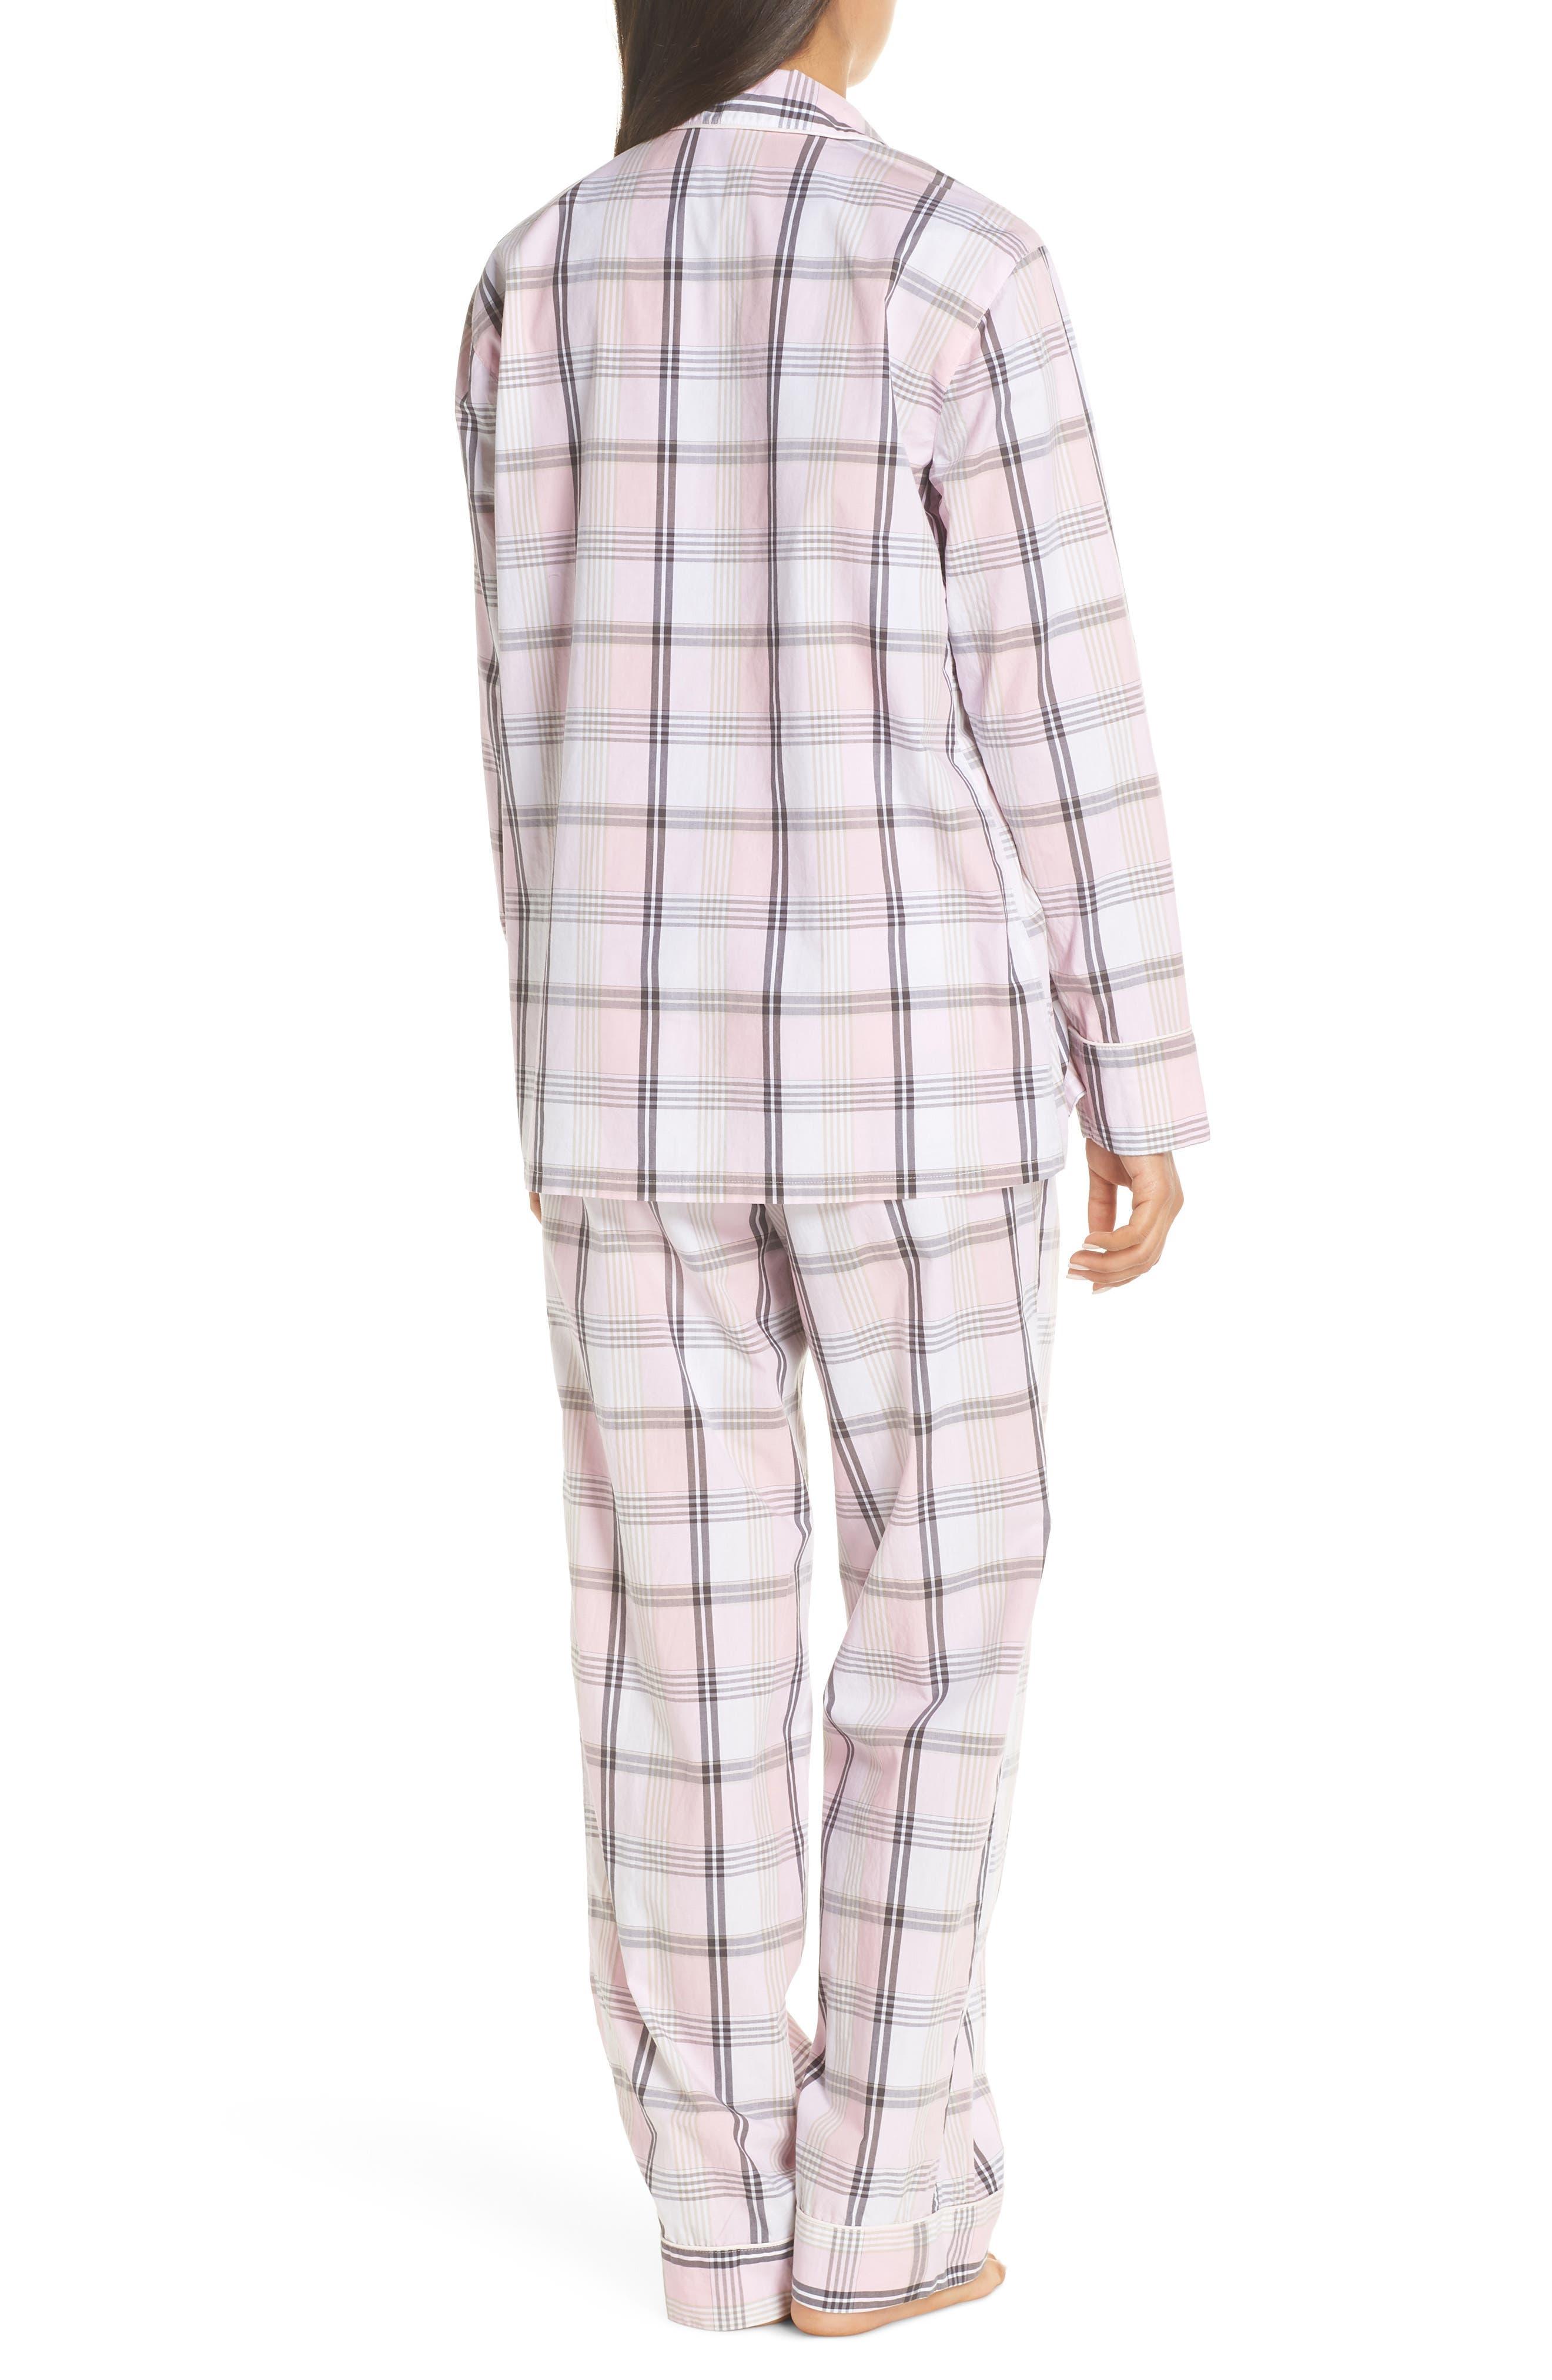 Cotton Pajamas,                             Alternate thumbnail 2, color,                             PINK COAL